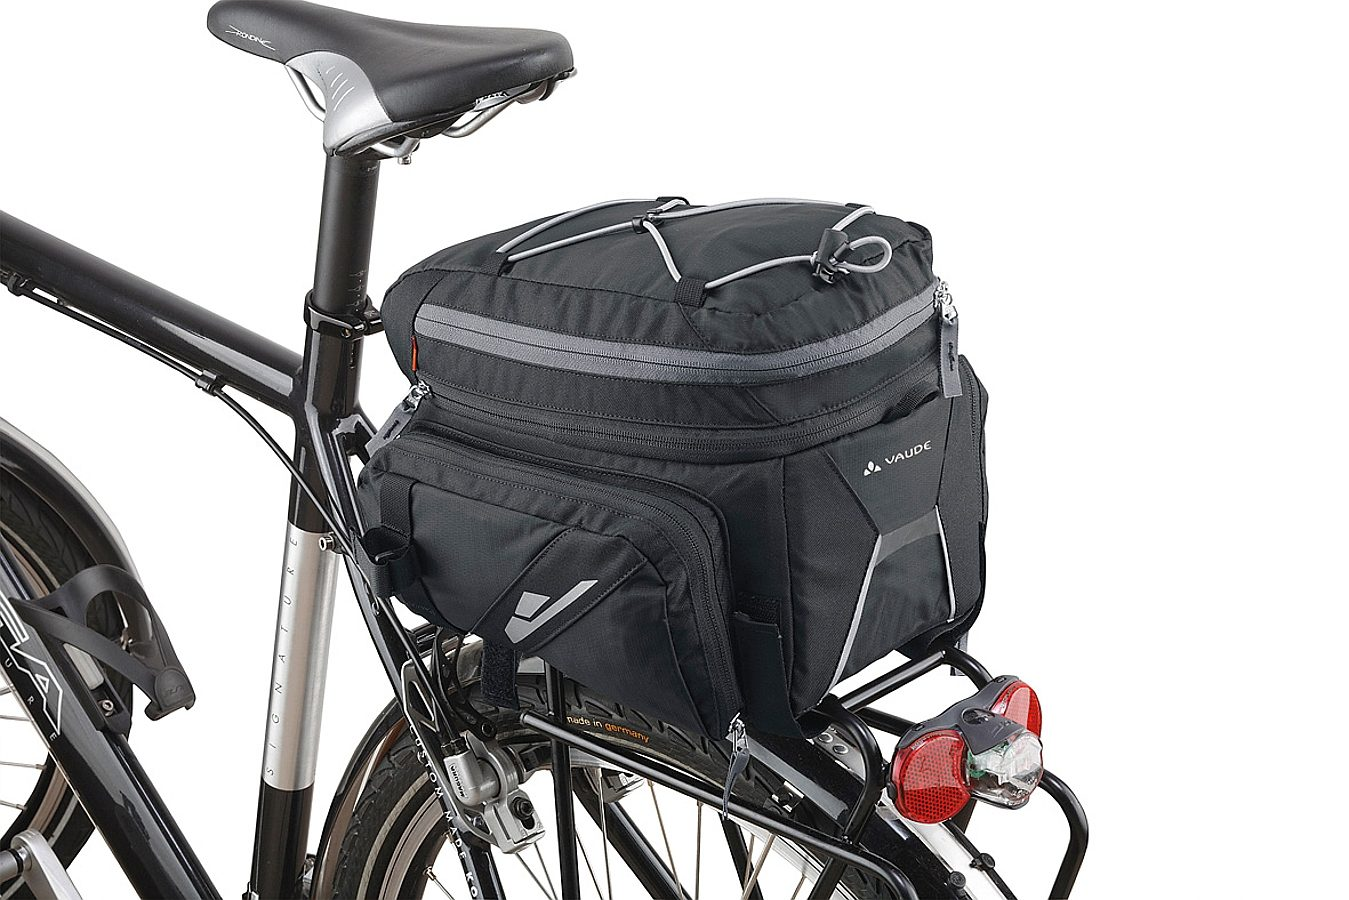 VAUDE Gepäckträgertasche »Silkroad Plus Panniers«